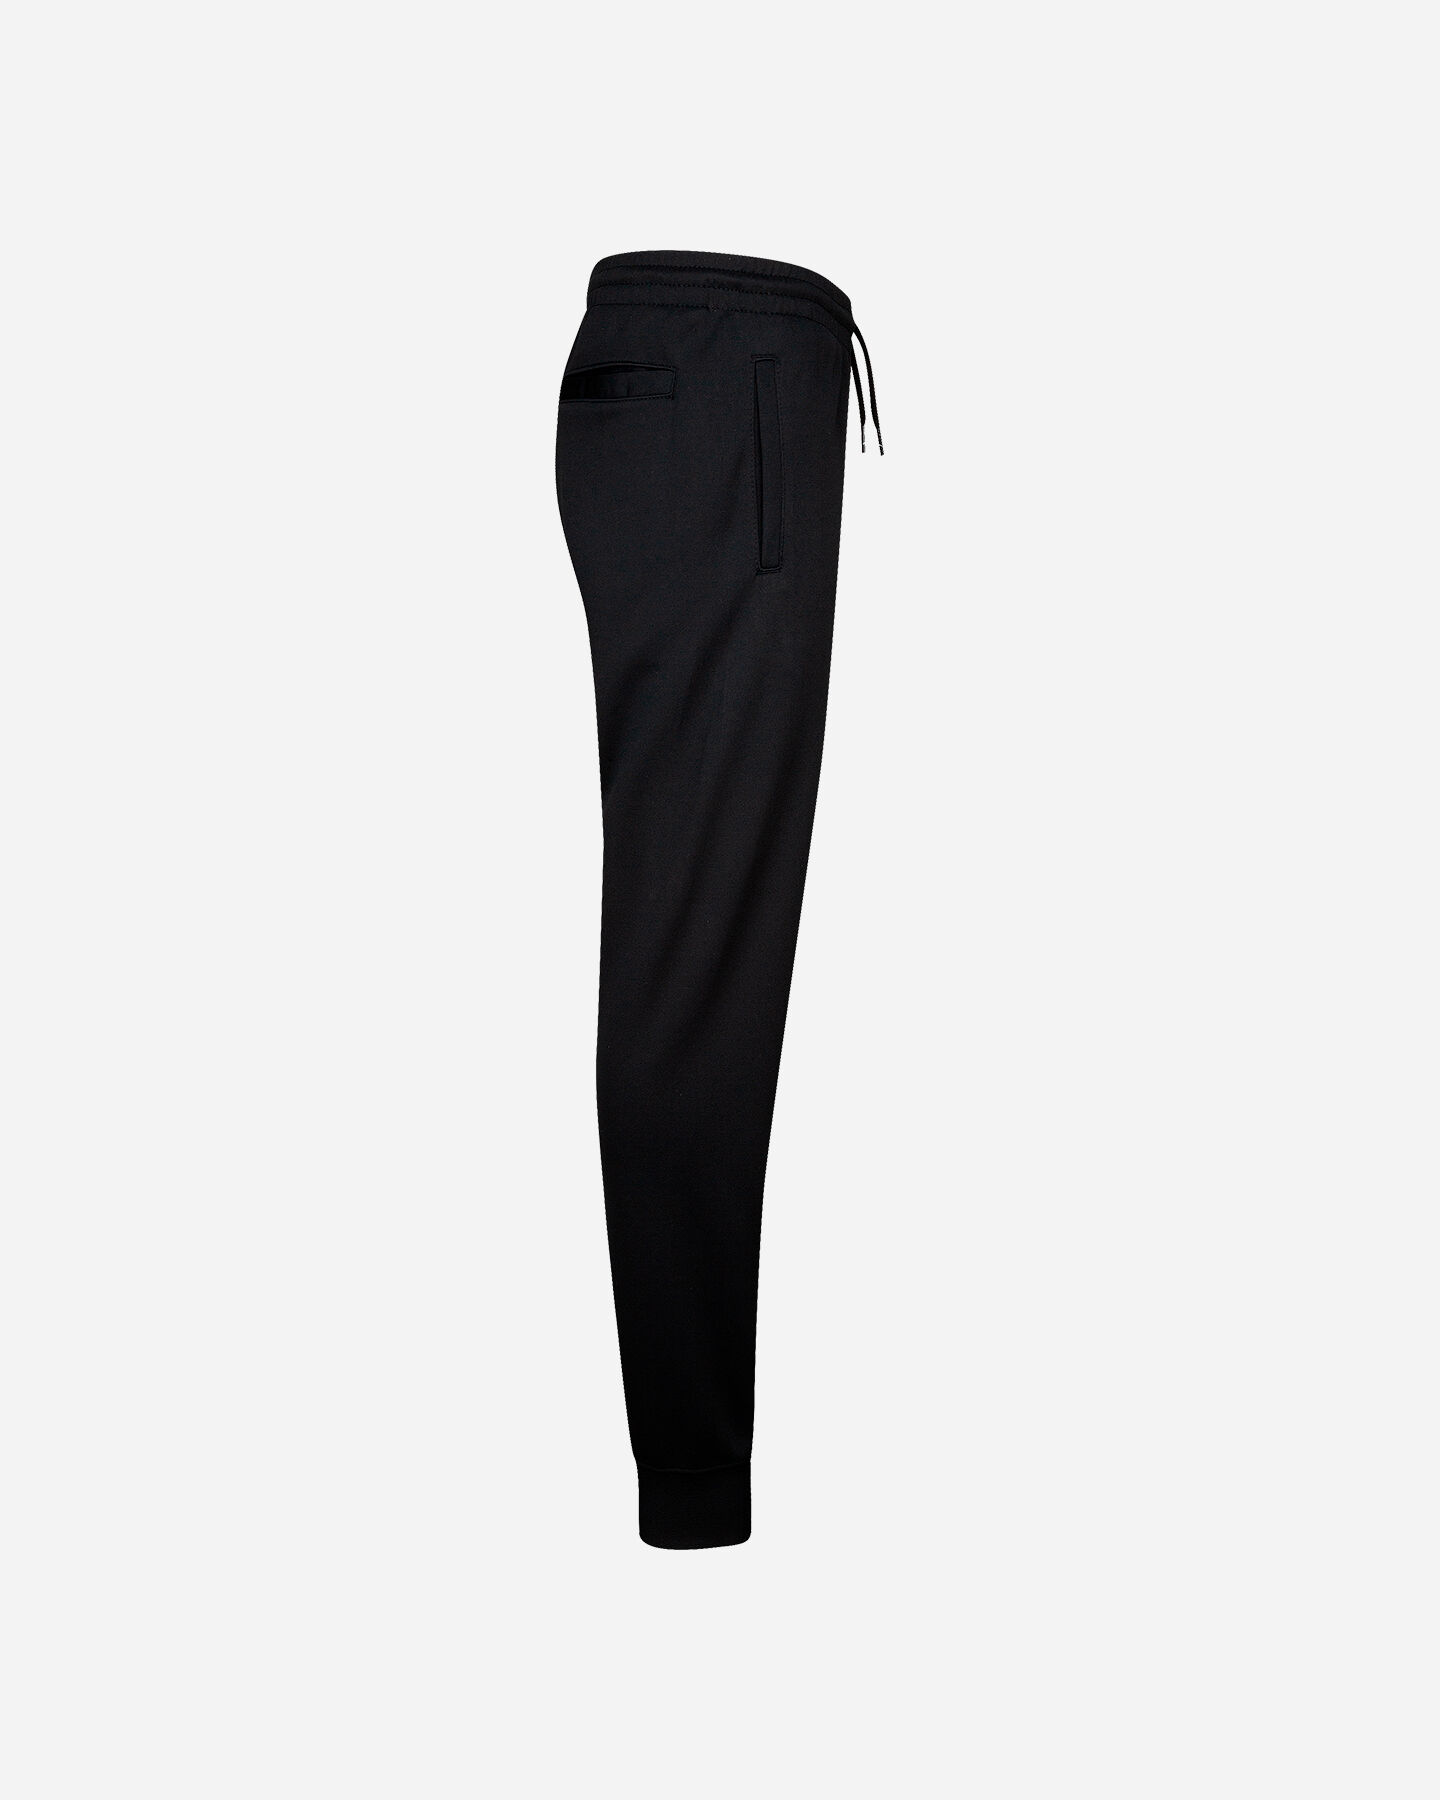 Pantaloncini basket NIKE JORDAN JUMPMAN CLASSIC III JR S5179457 scatto 1